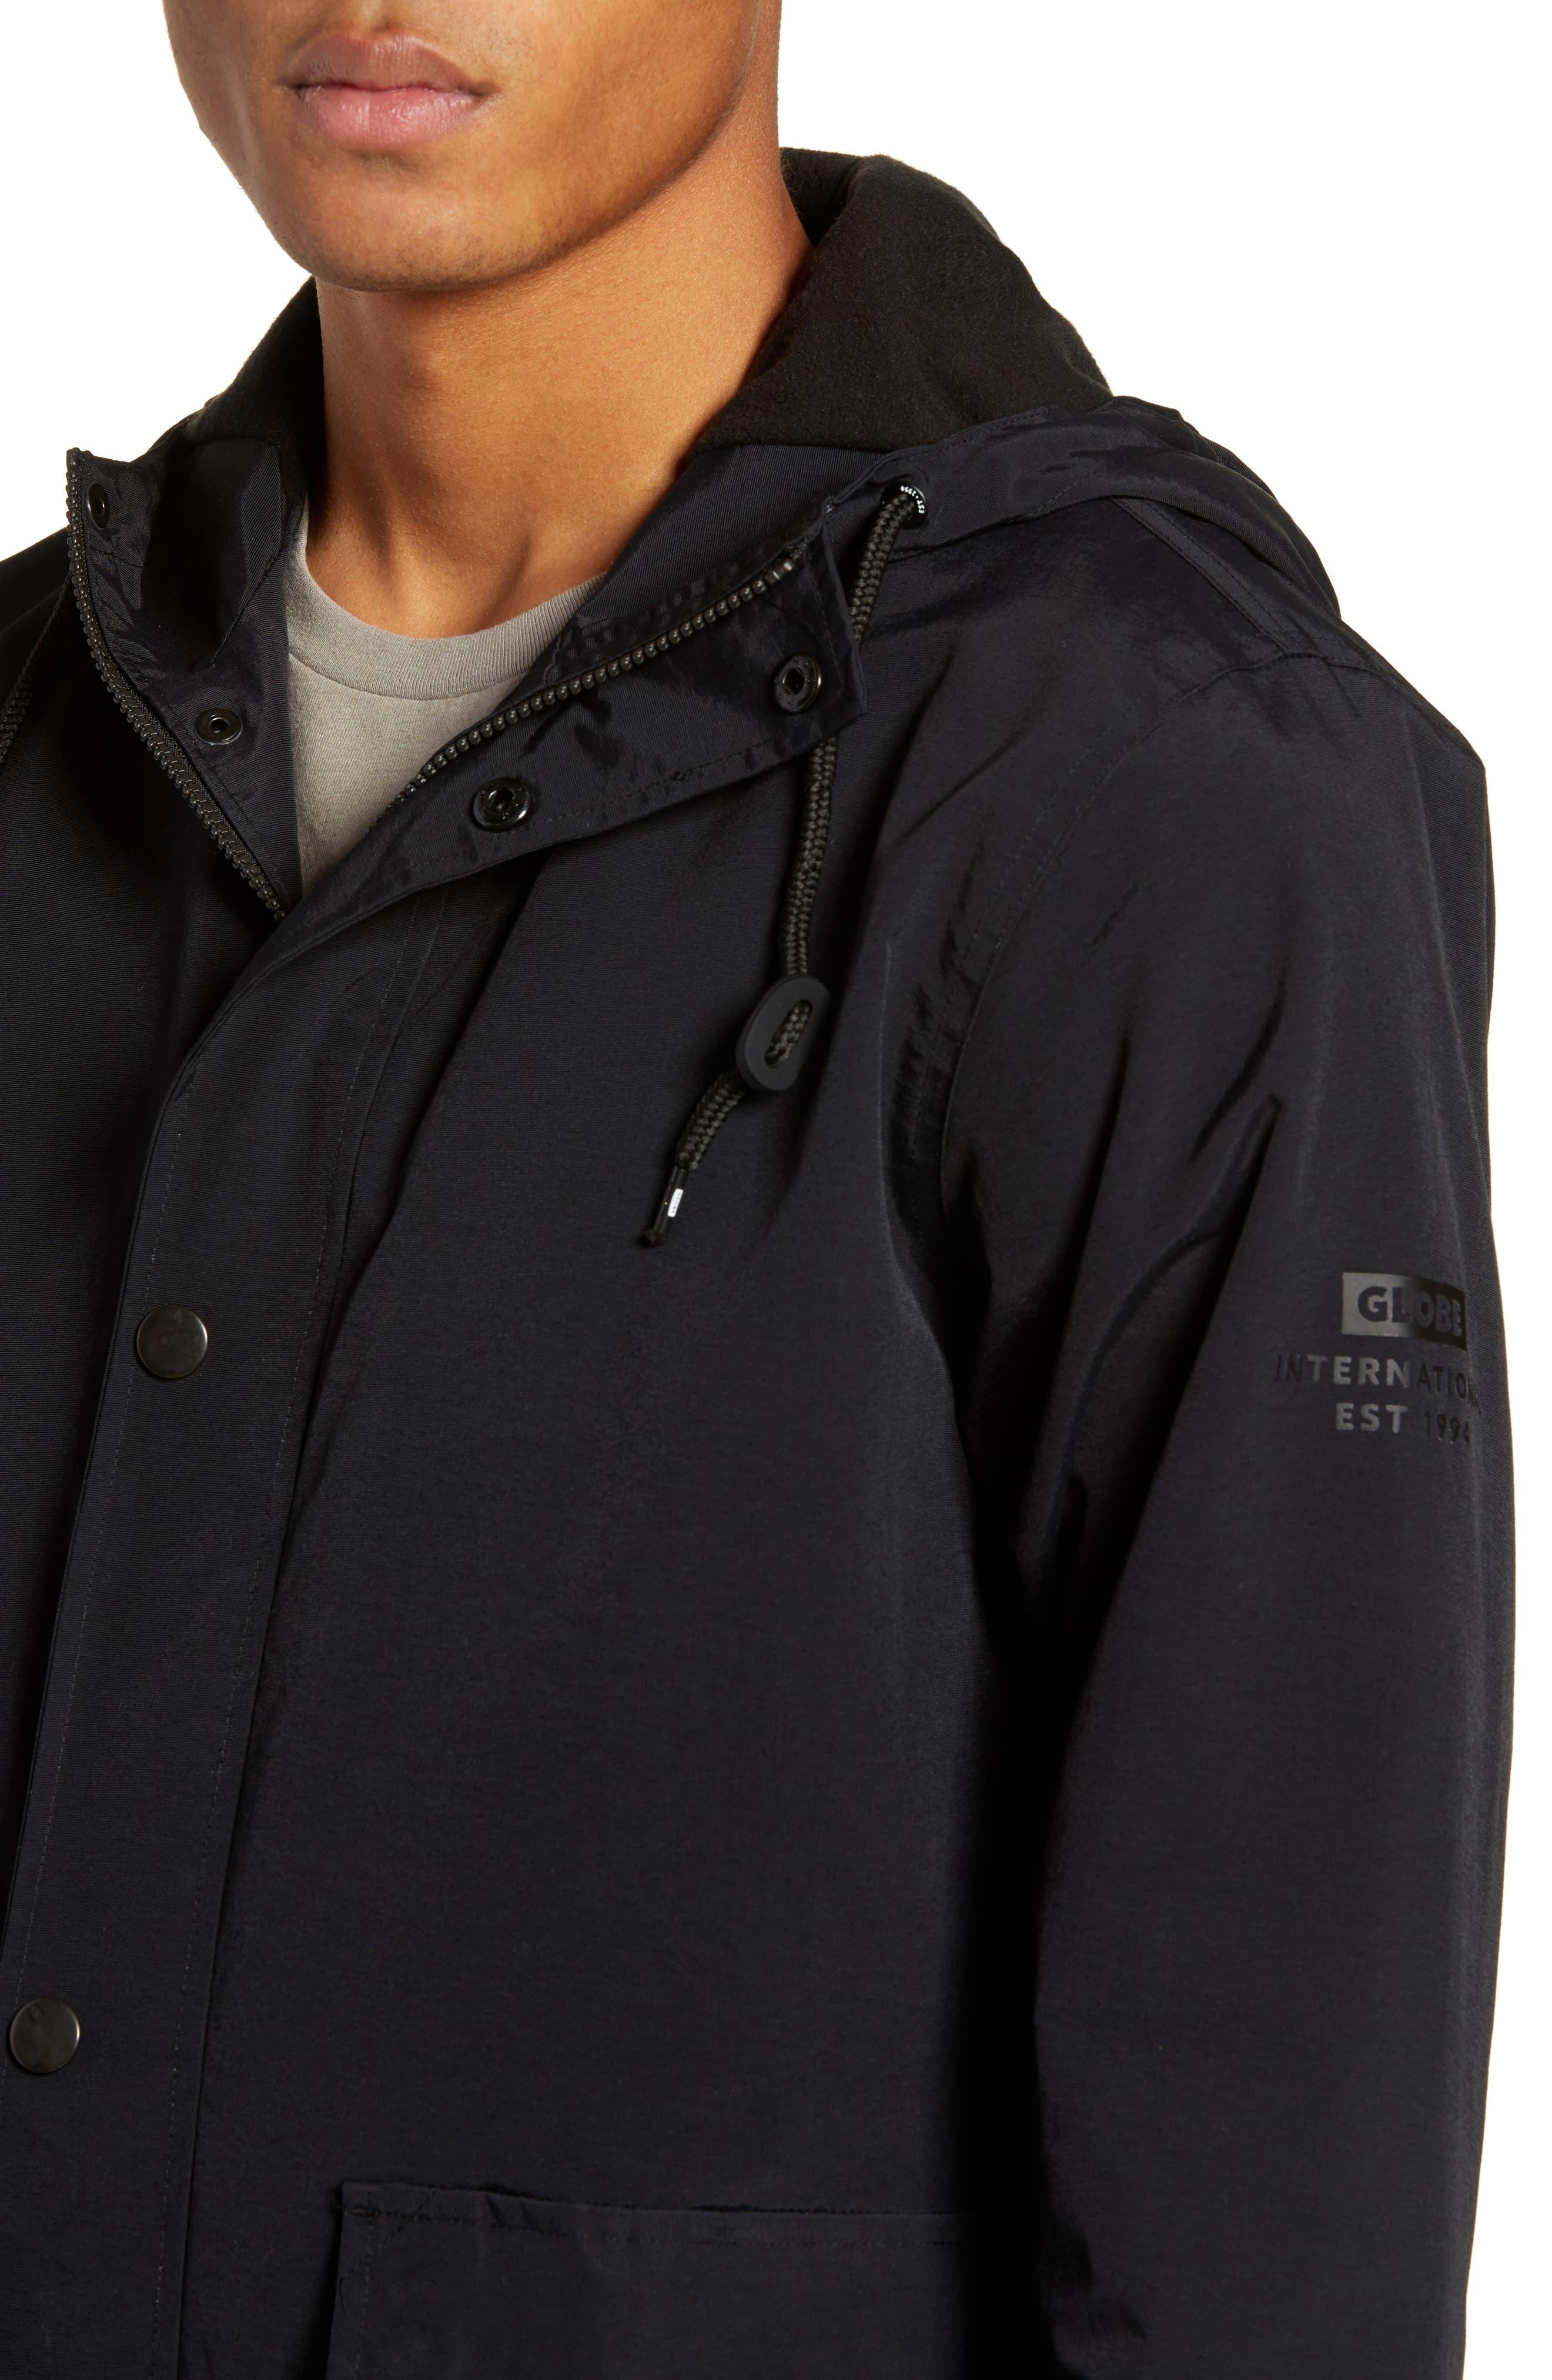 Goodstock Utility Jacket,                             Alternate thumbnail 4, color,                             BLACK